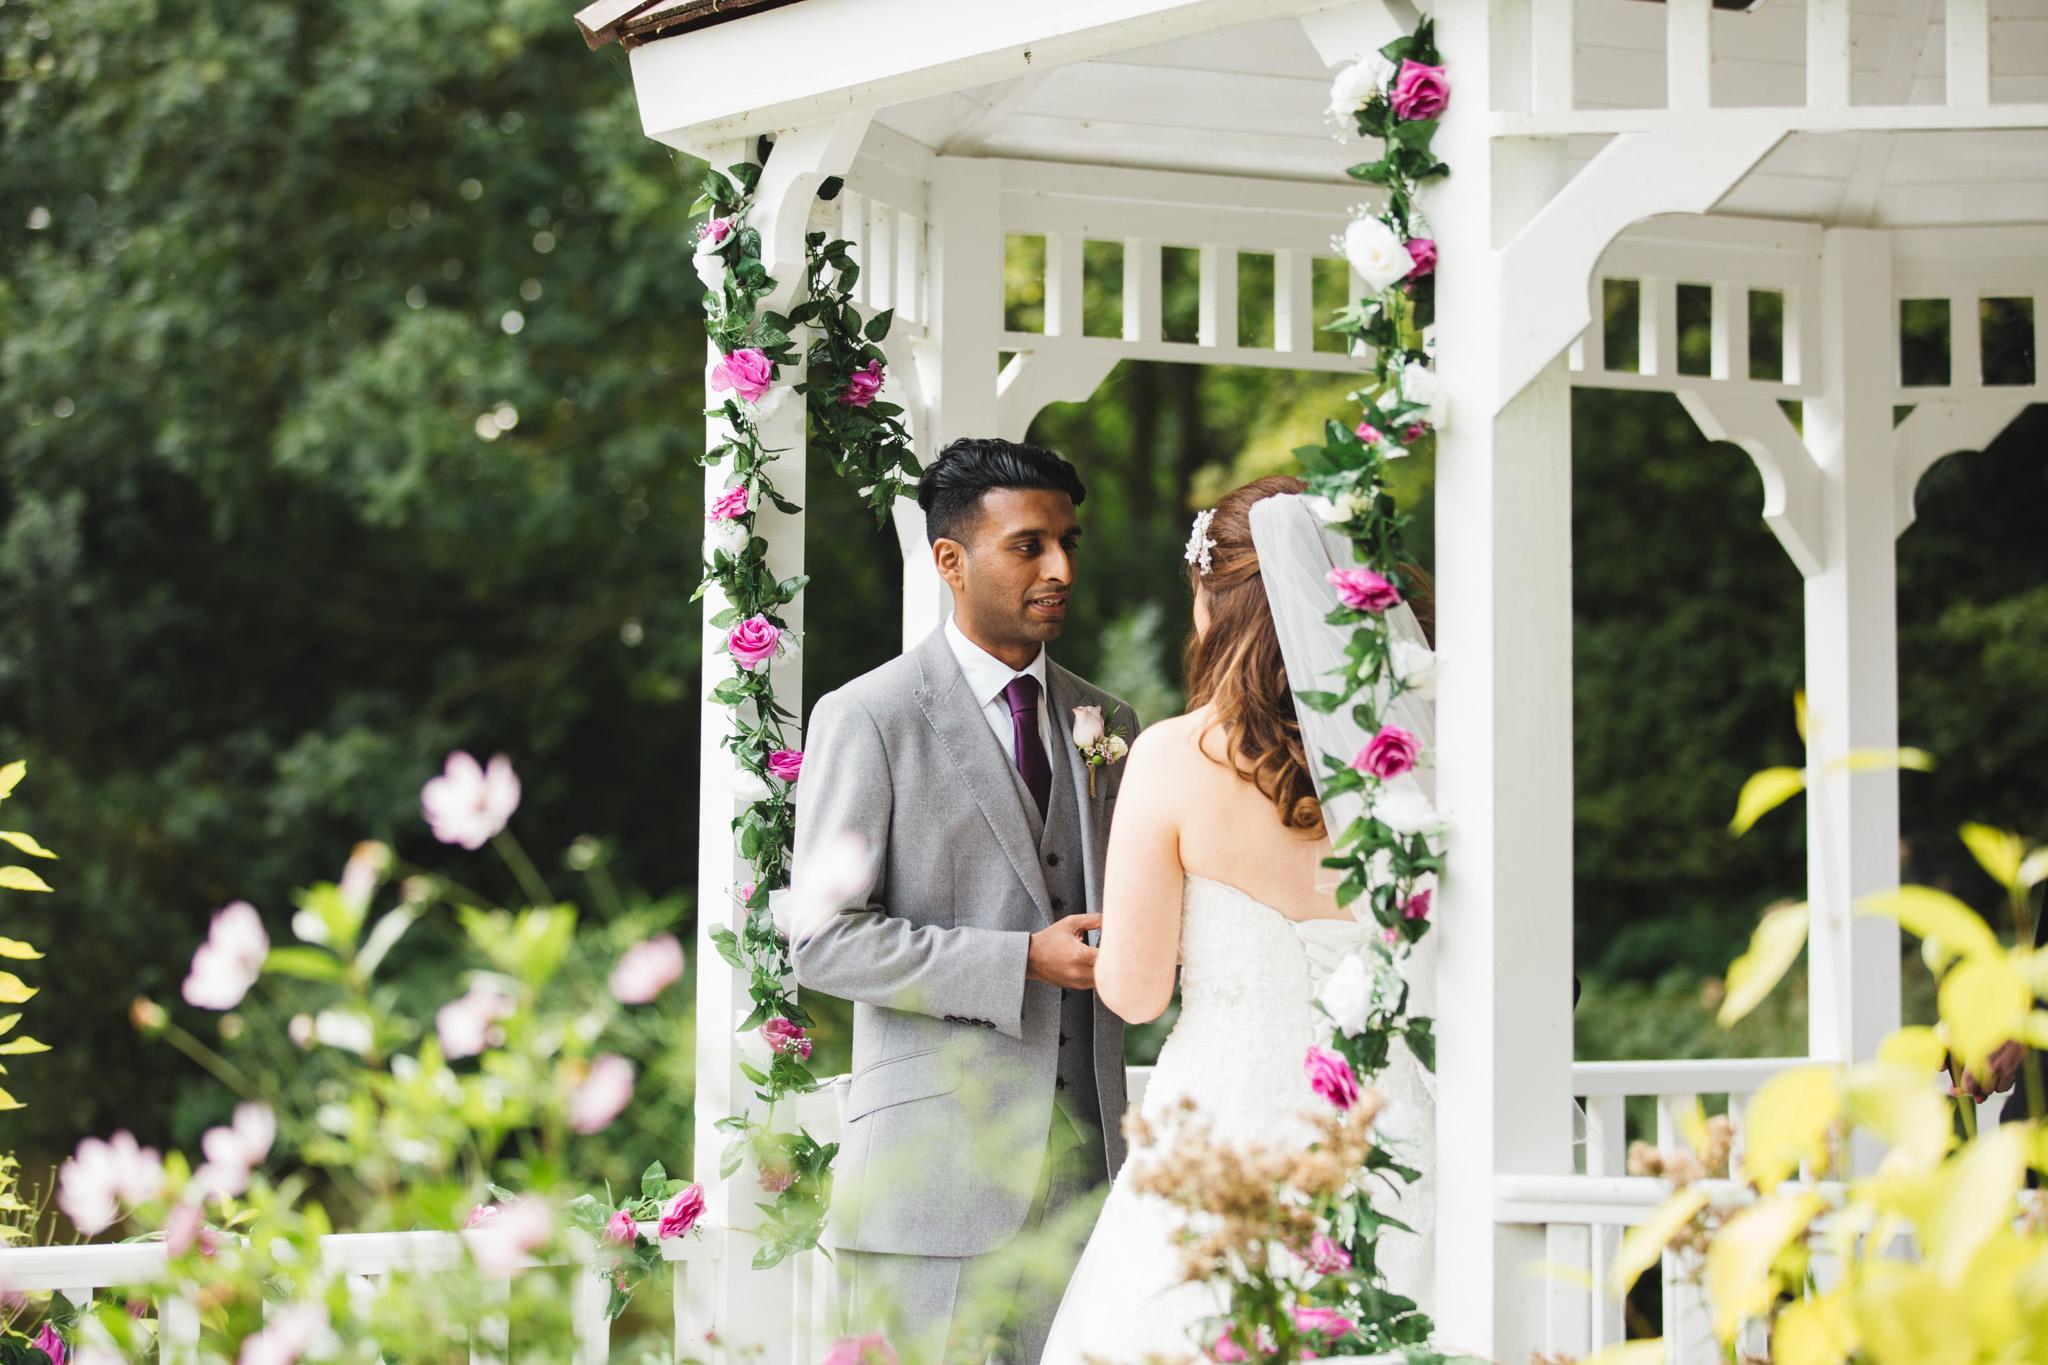 cat-lane-weddings__sheene-mill-wedding-photography__clw__1424_4G2A2963.jpg